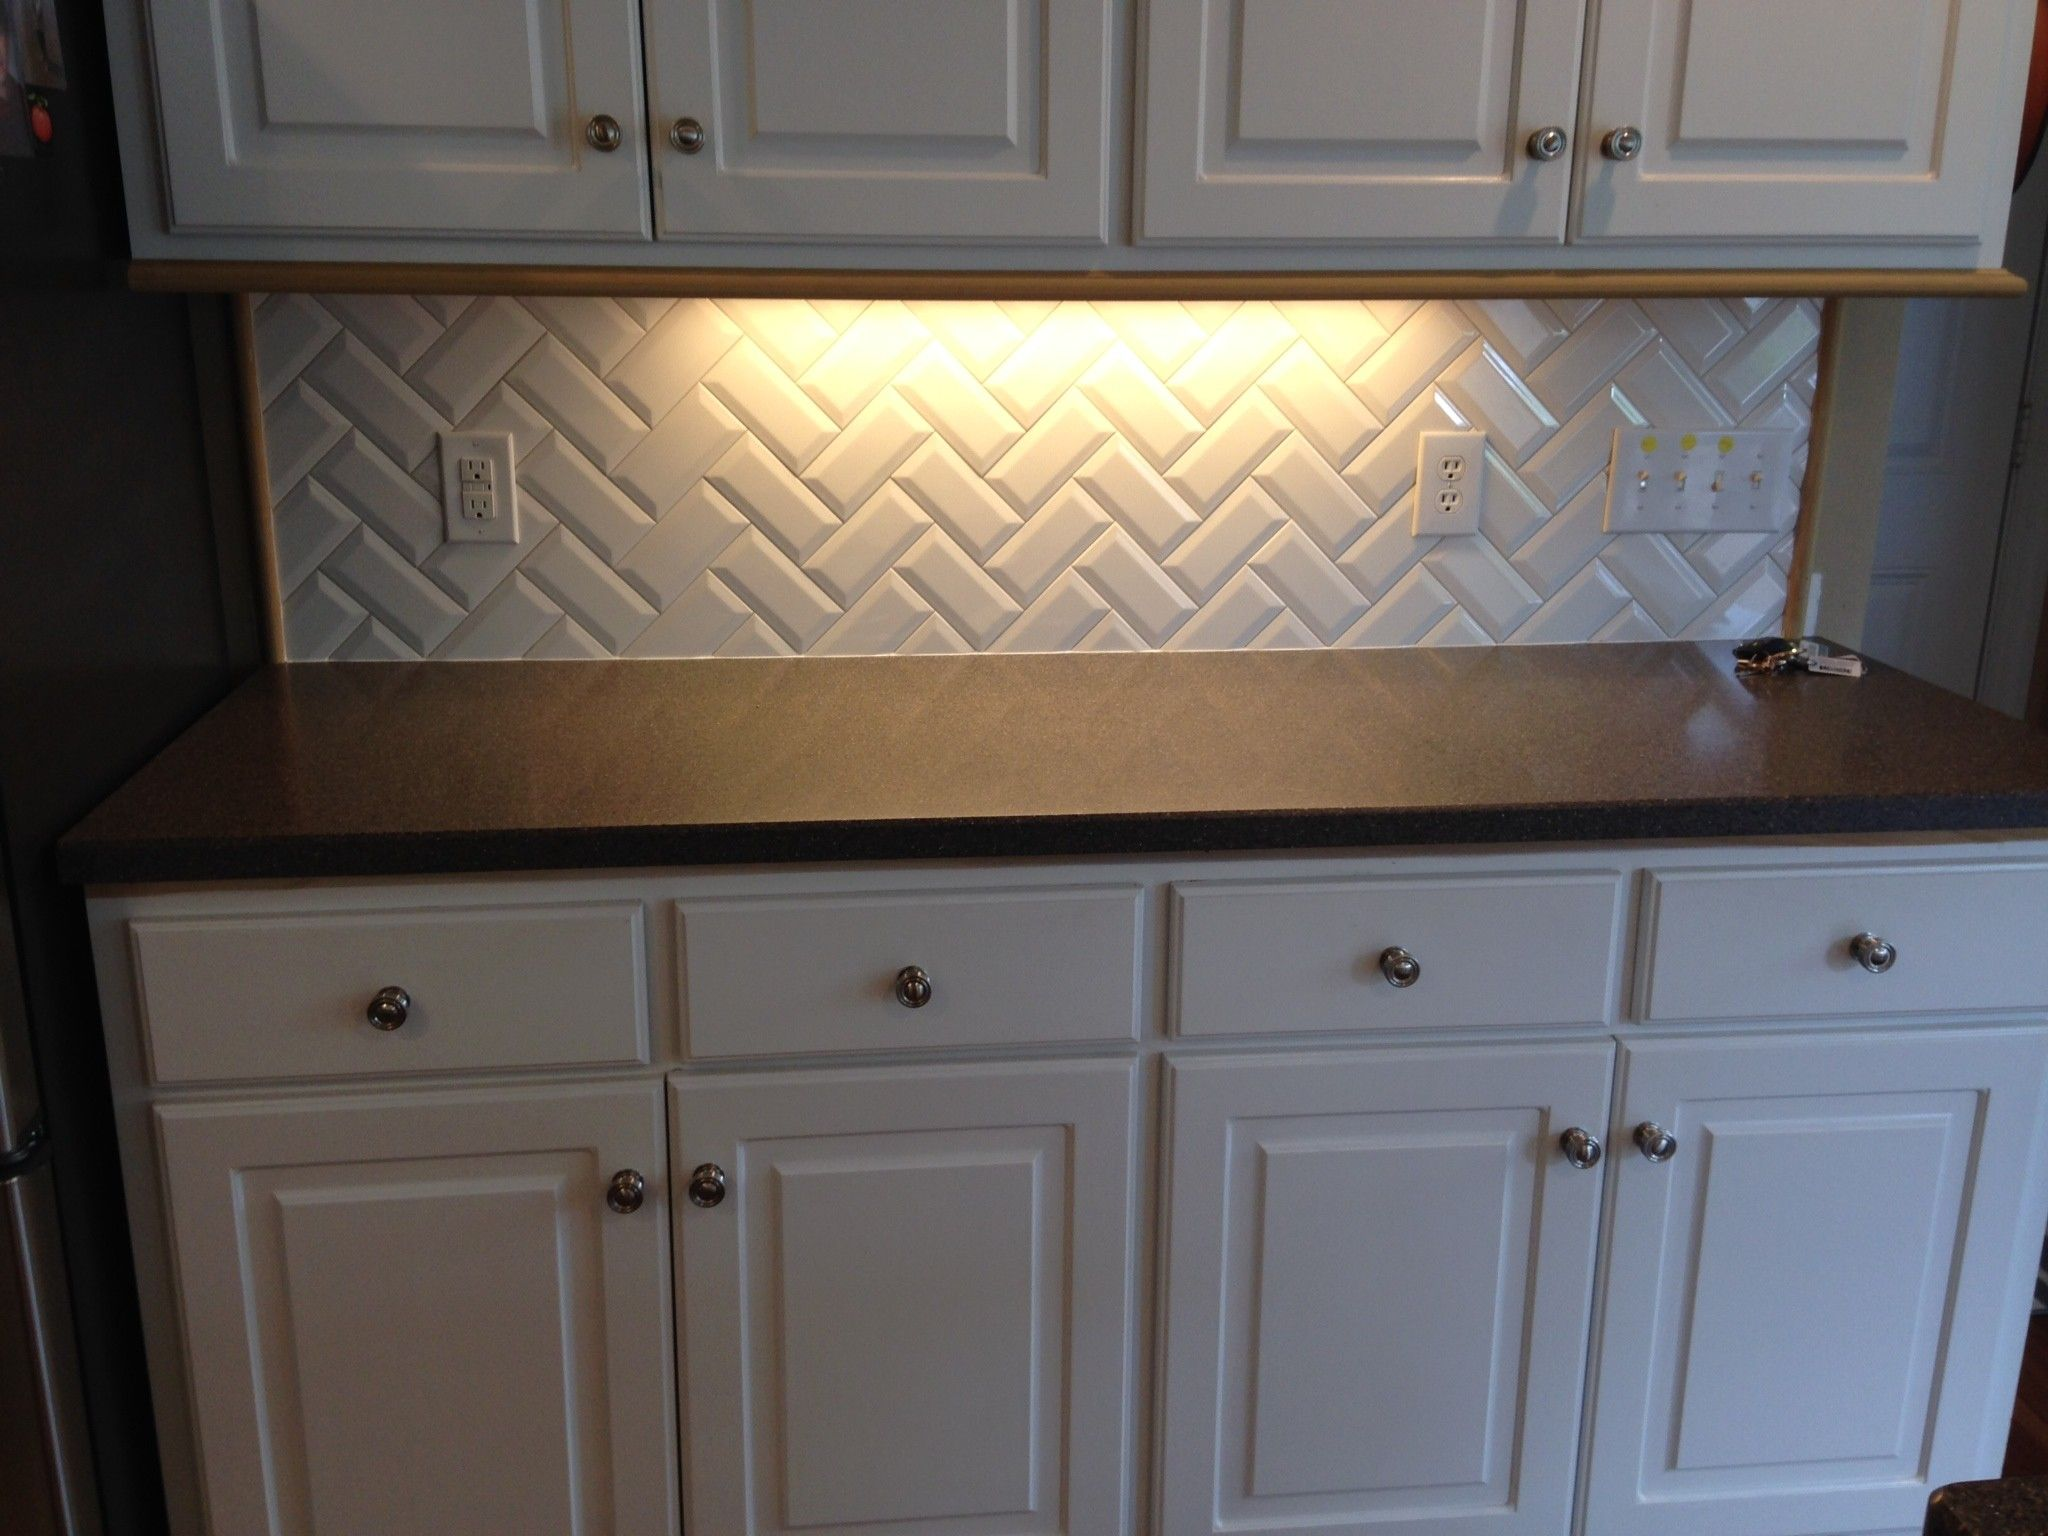 White Tile Backsplash Kitchen Vacuum Primus 3x6 Quot Beveled Subway In Herringbone